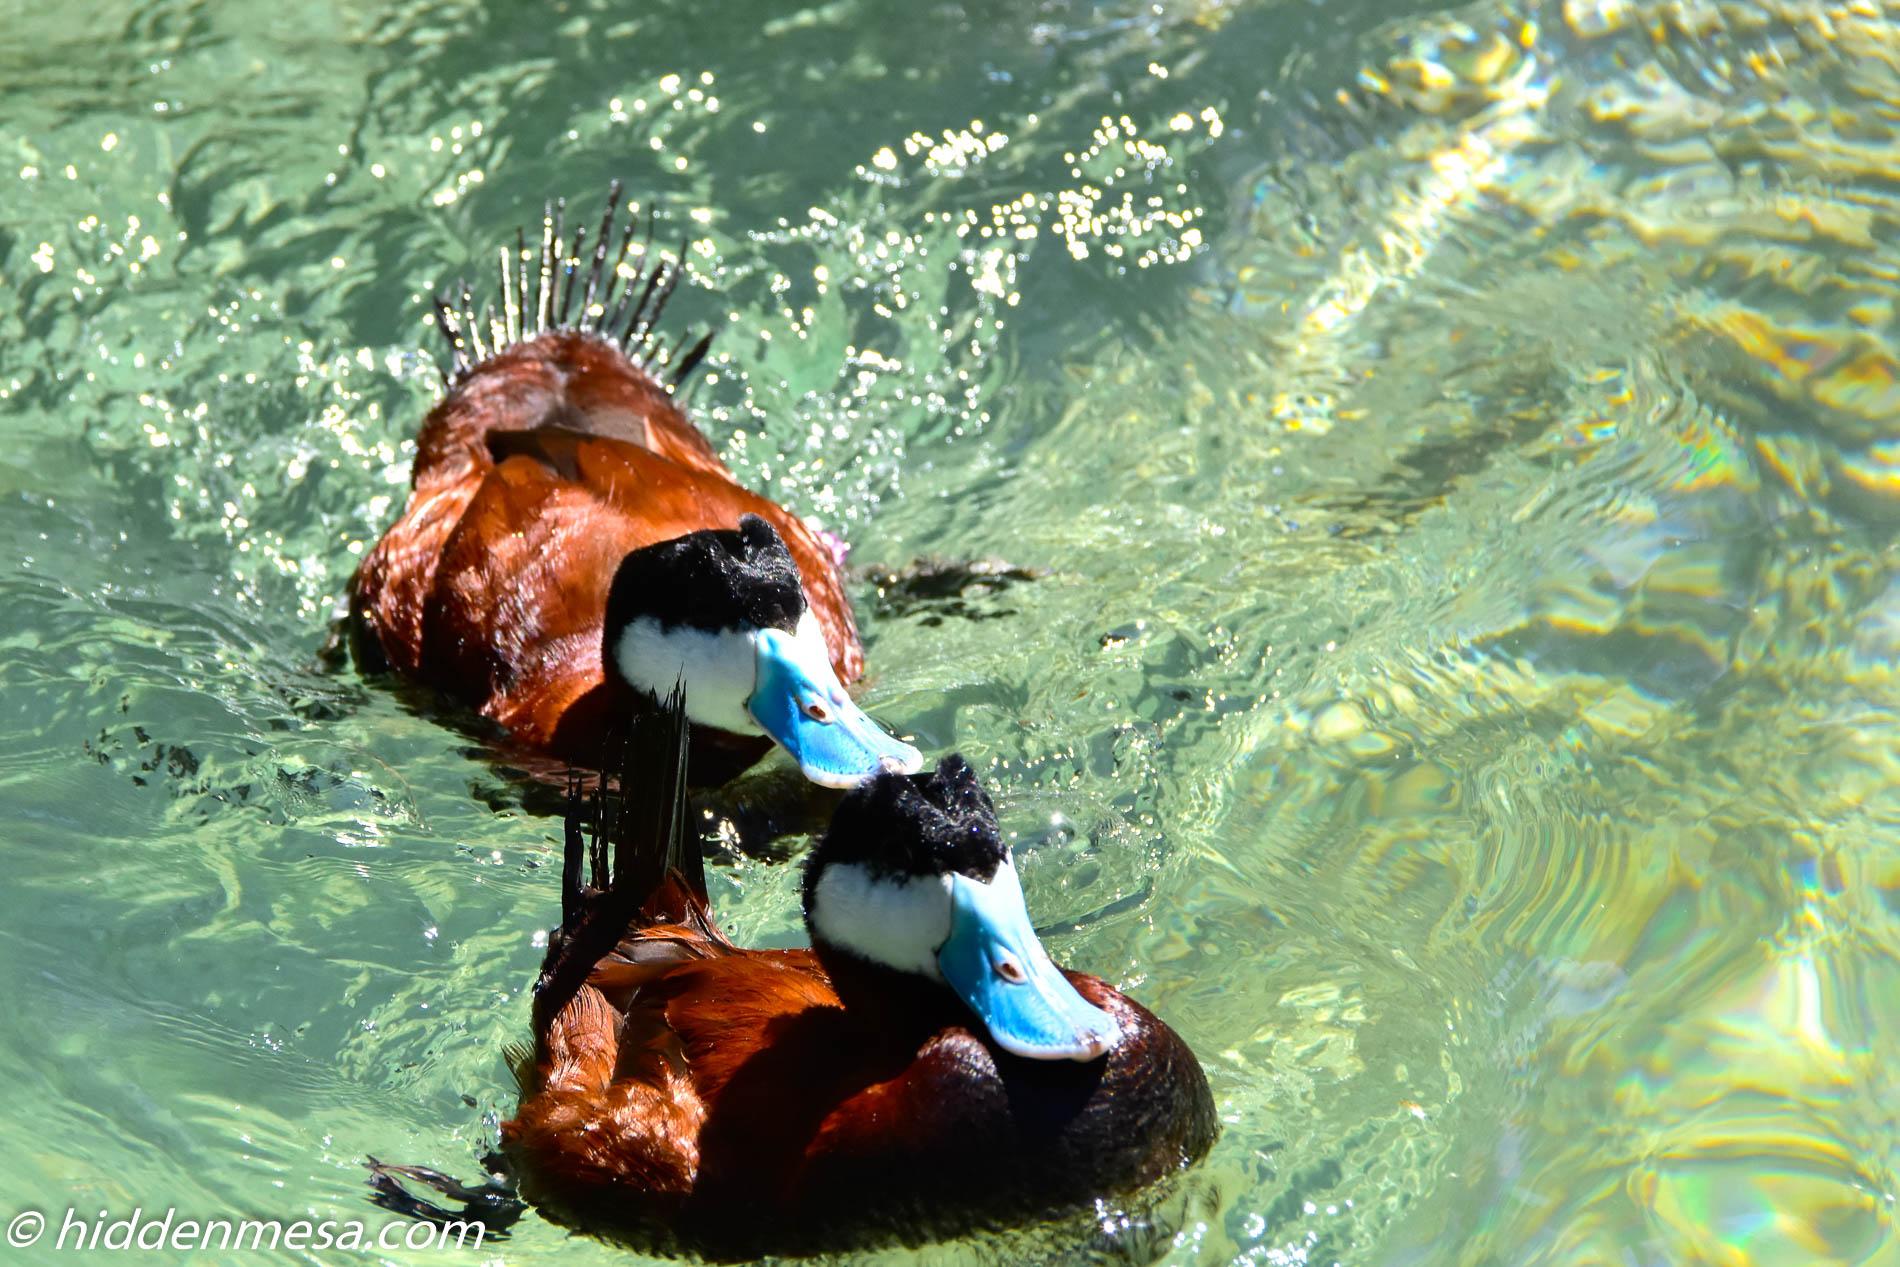 Two Ruddy Ducks